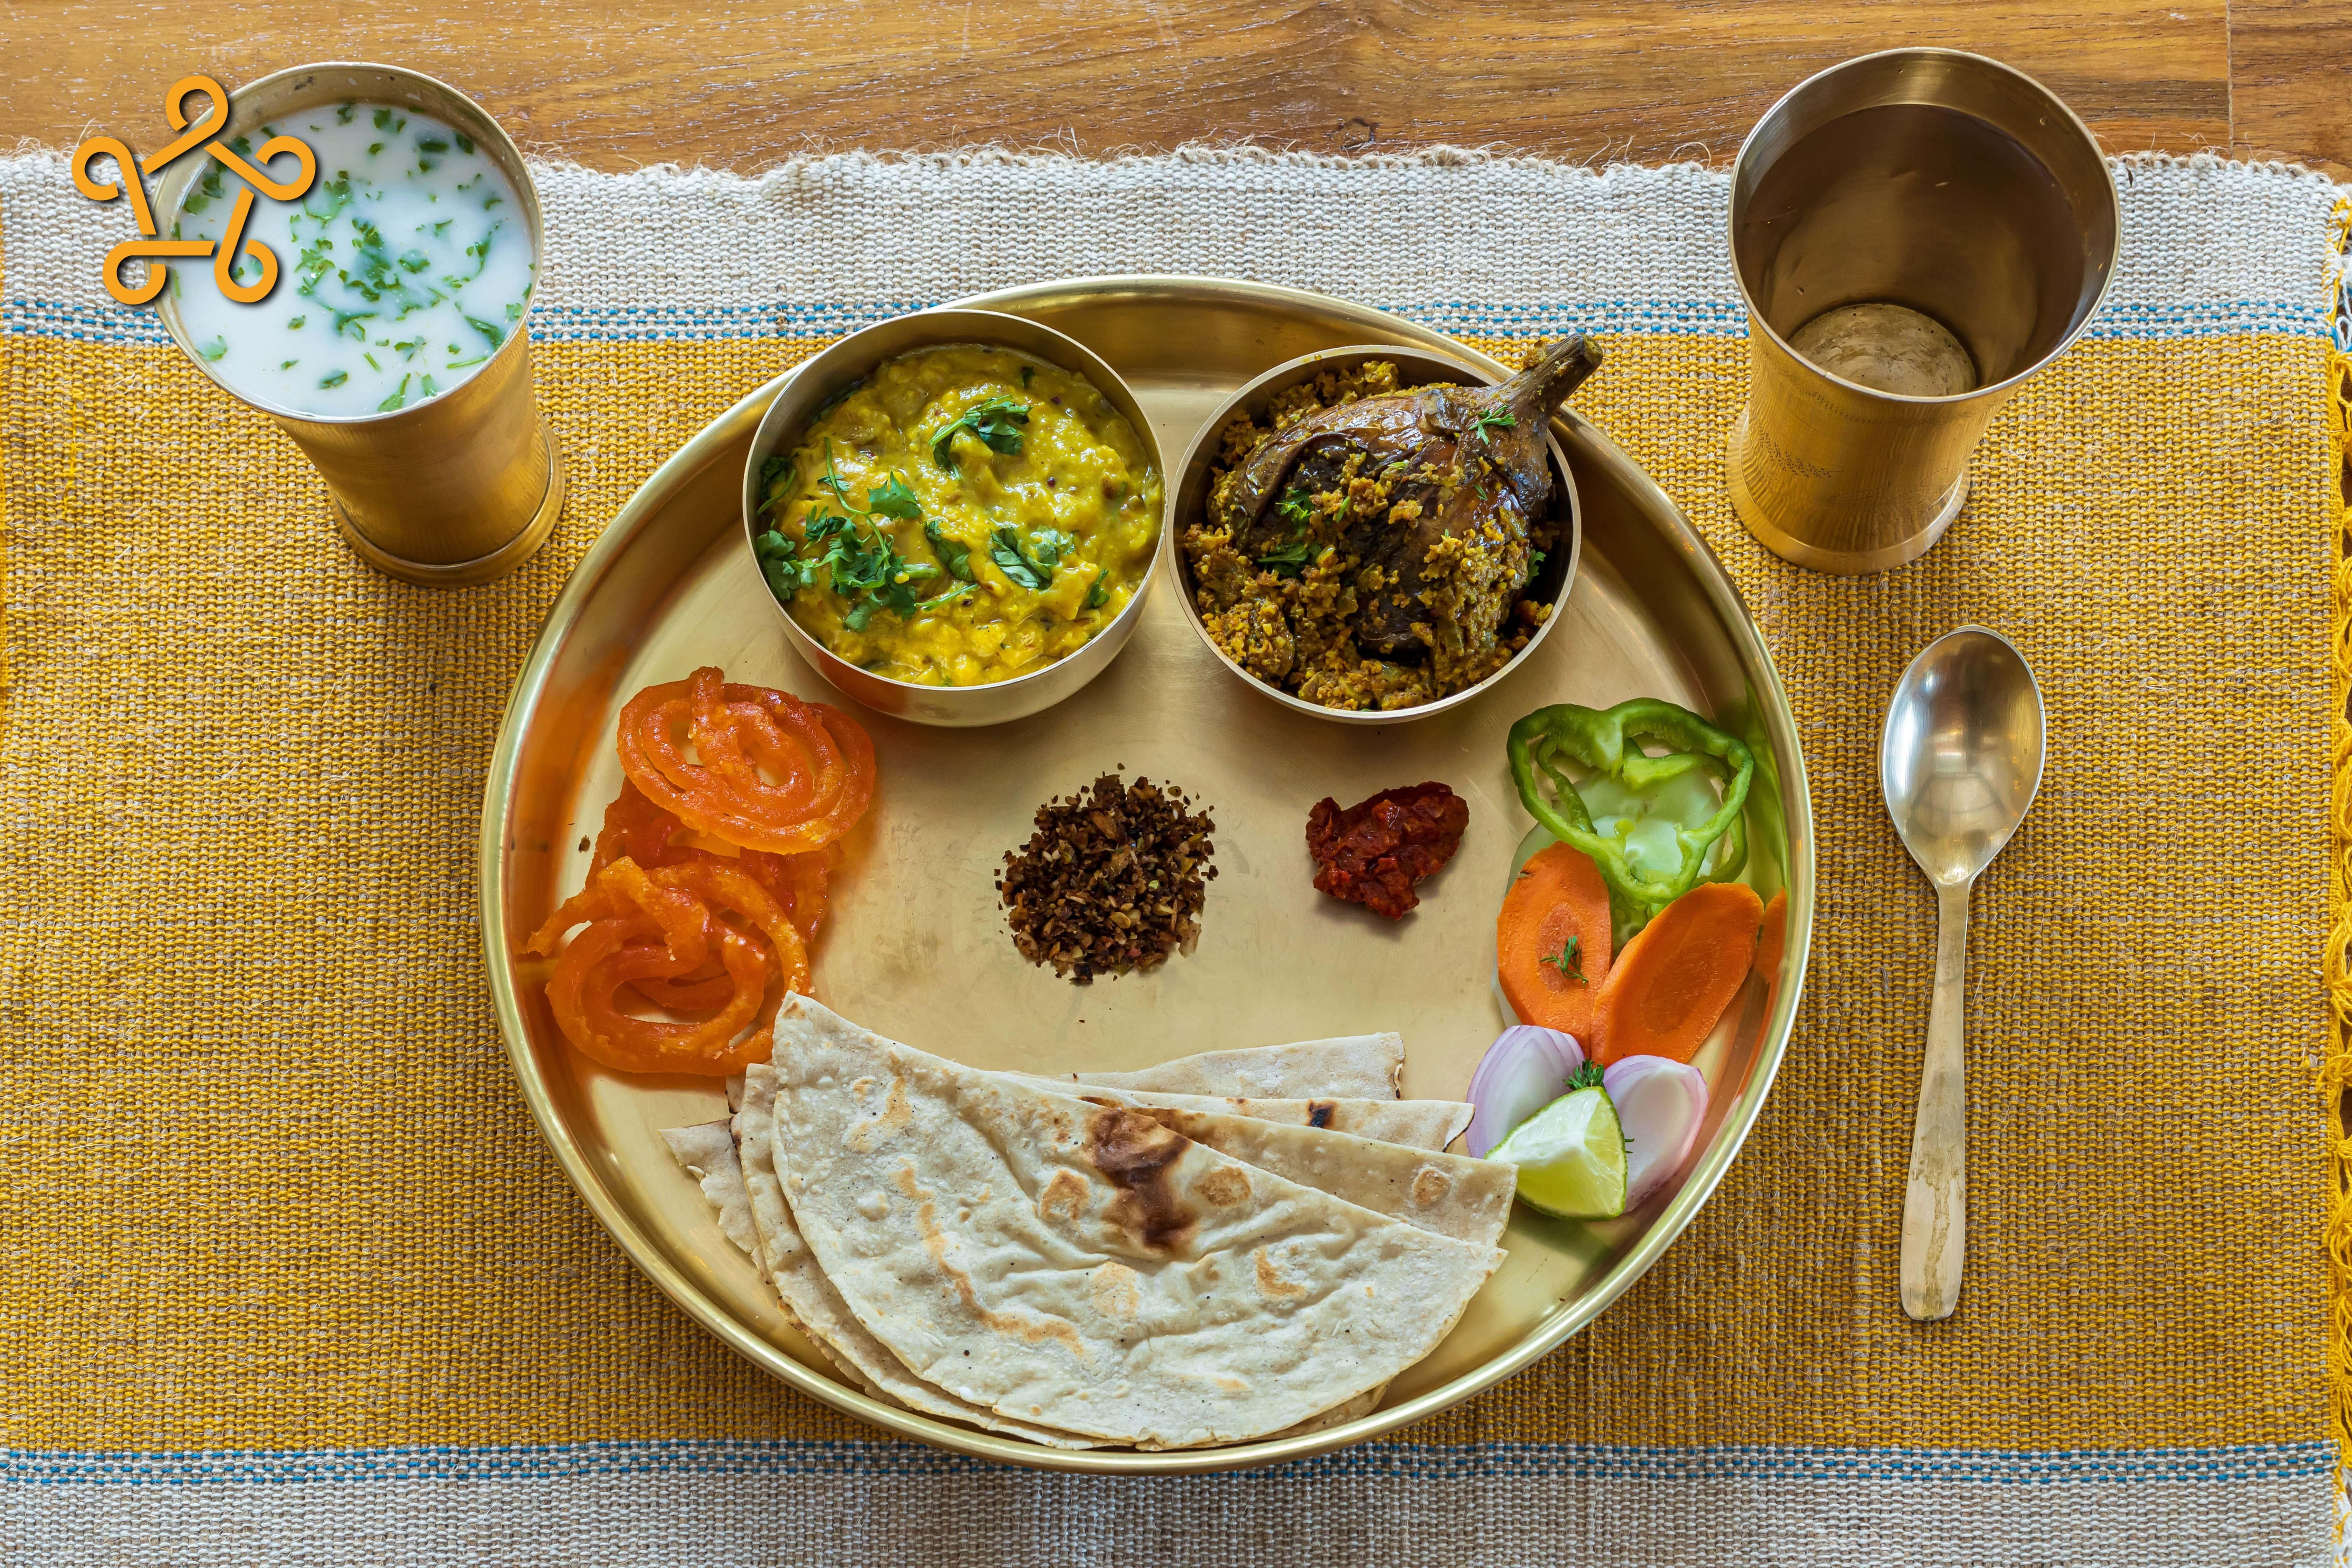 Lunch at Avabodha